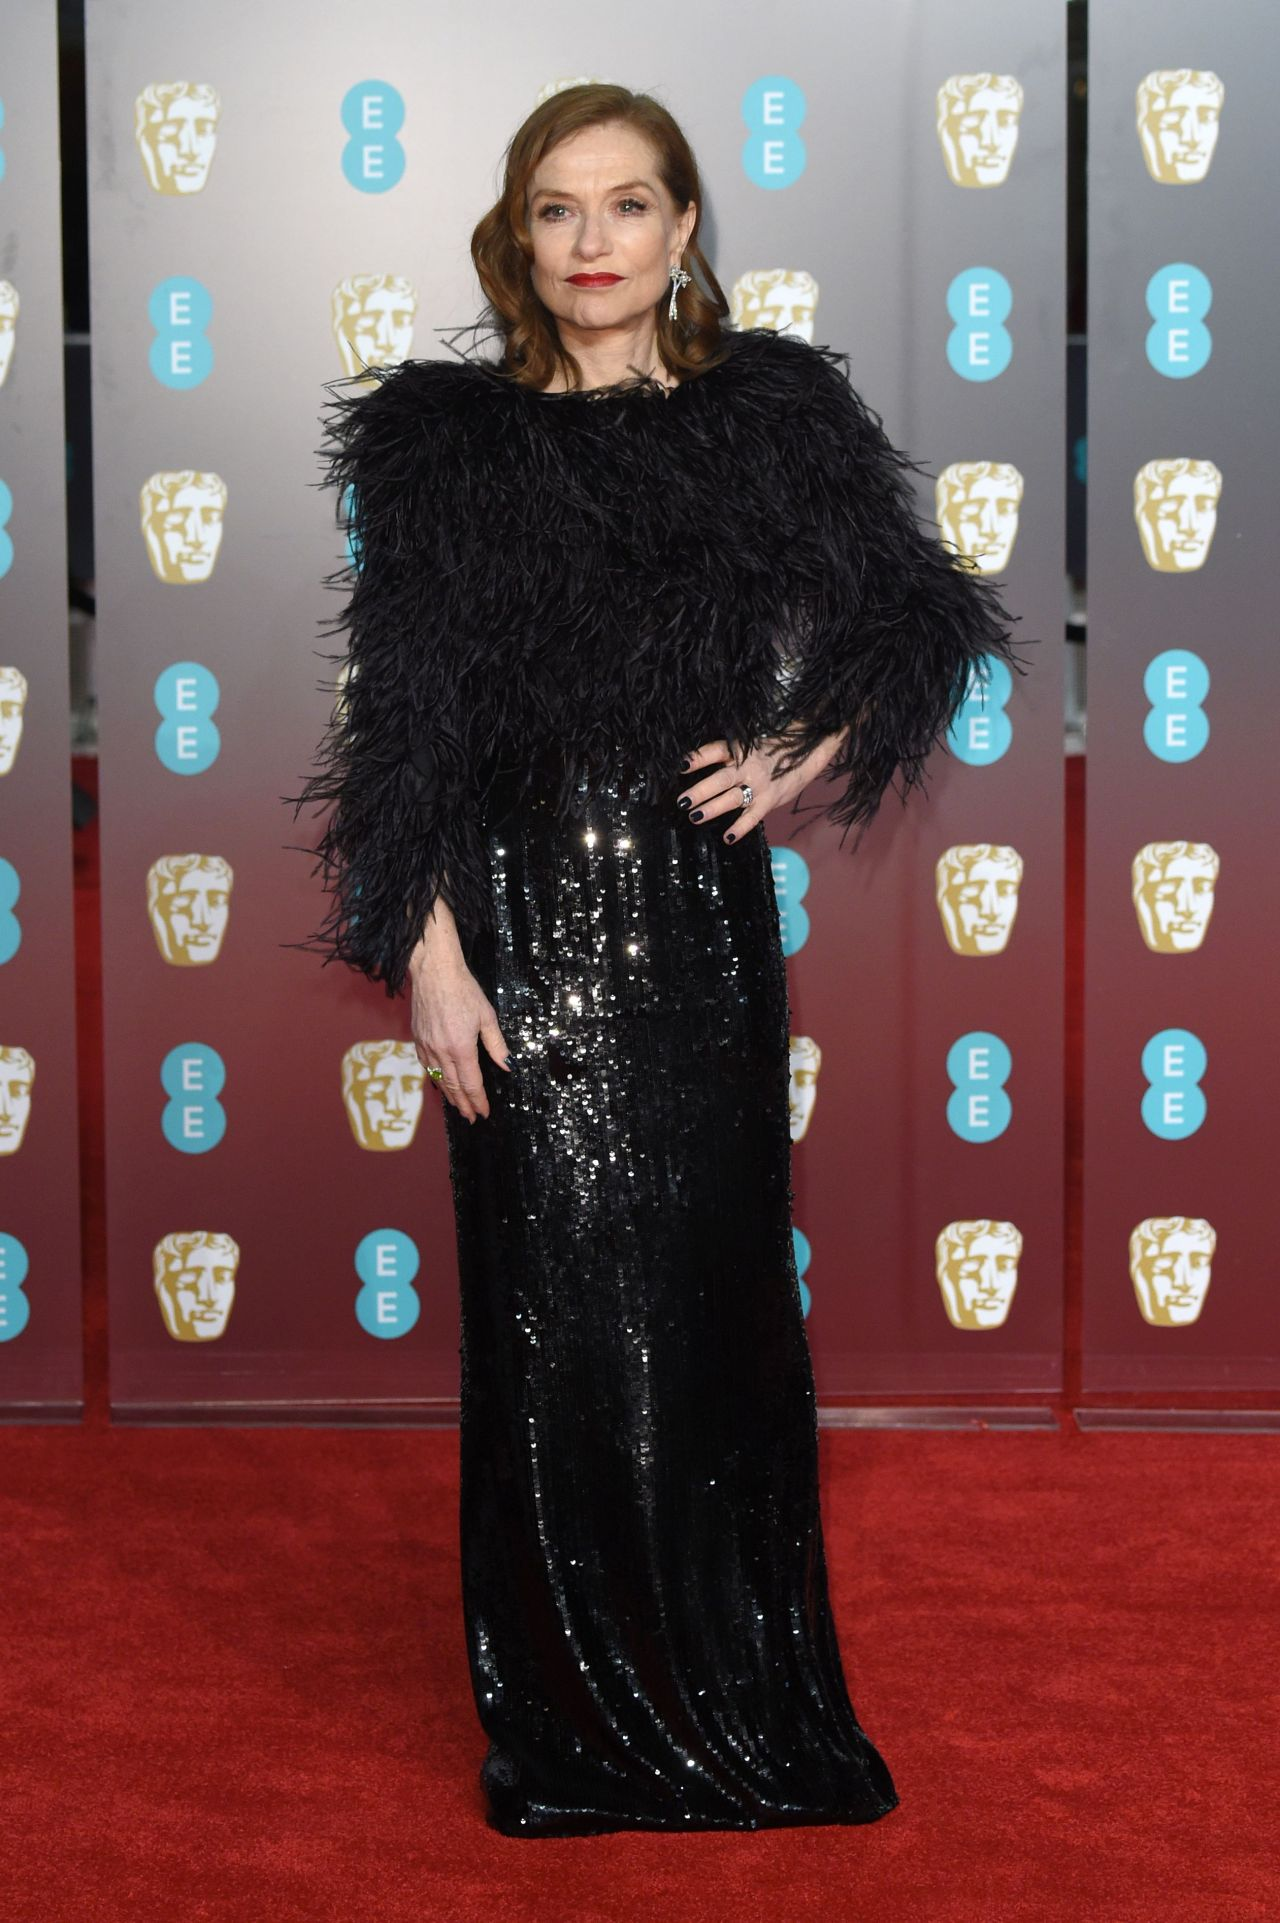 http://celebmafia.com/wp-content/uploads/2018/02/isabelle-huppert-2018-british-academy-film-awards-6.jpg